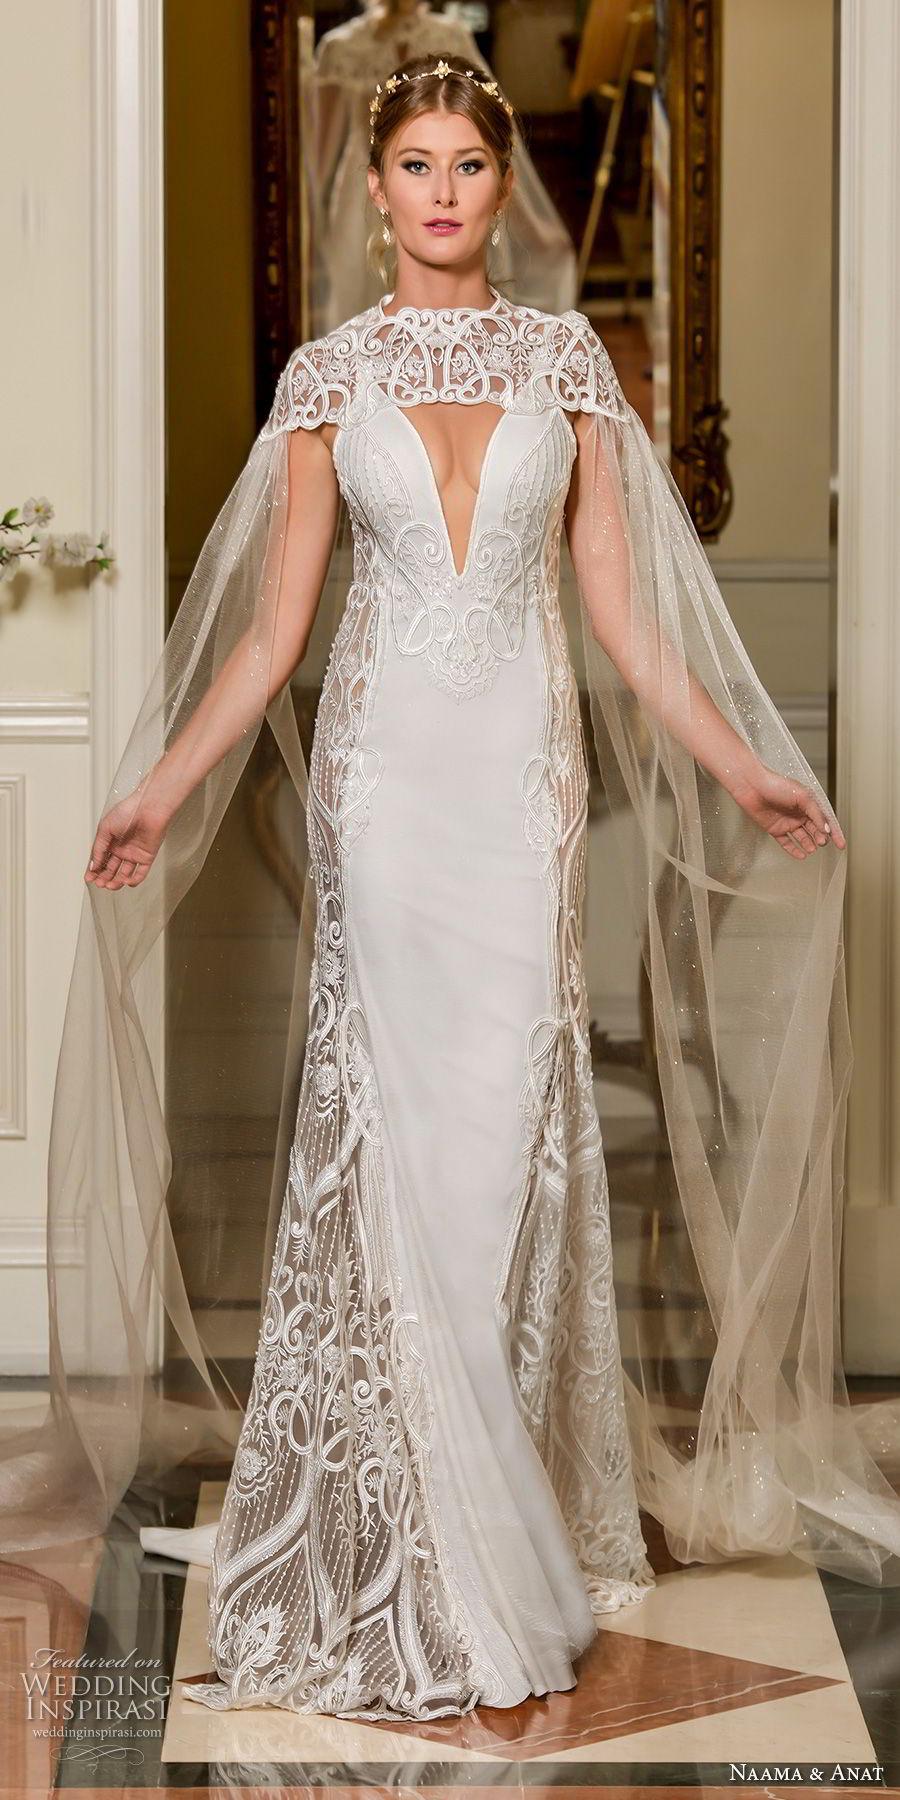 naama and anat fall 2018 bridal sleeveless deep plunging v neck heavily embellished bodice elegant sheath wedding dress with cape open back sweep train (6) mv